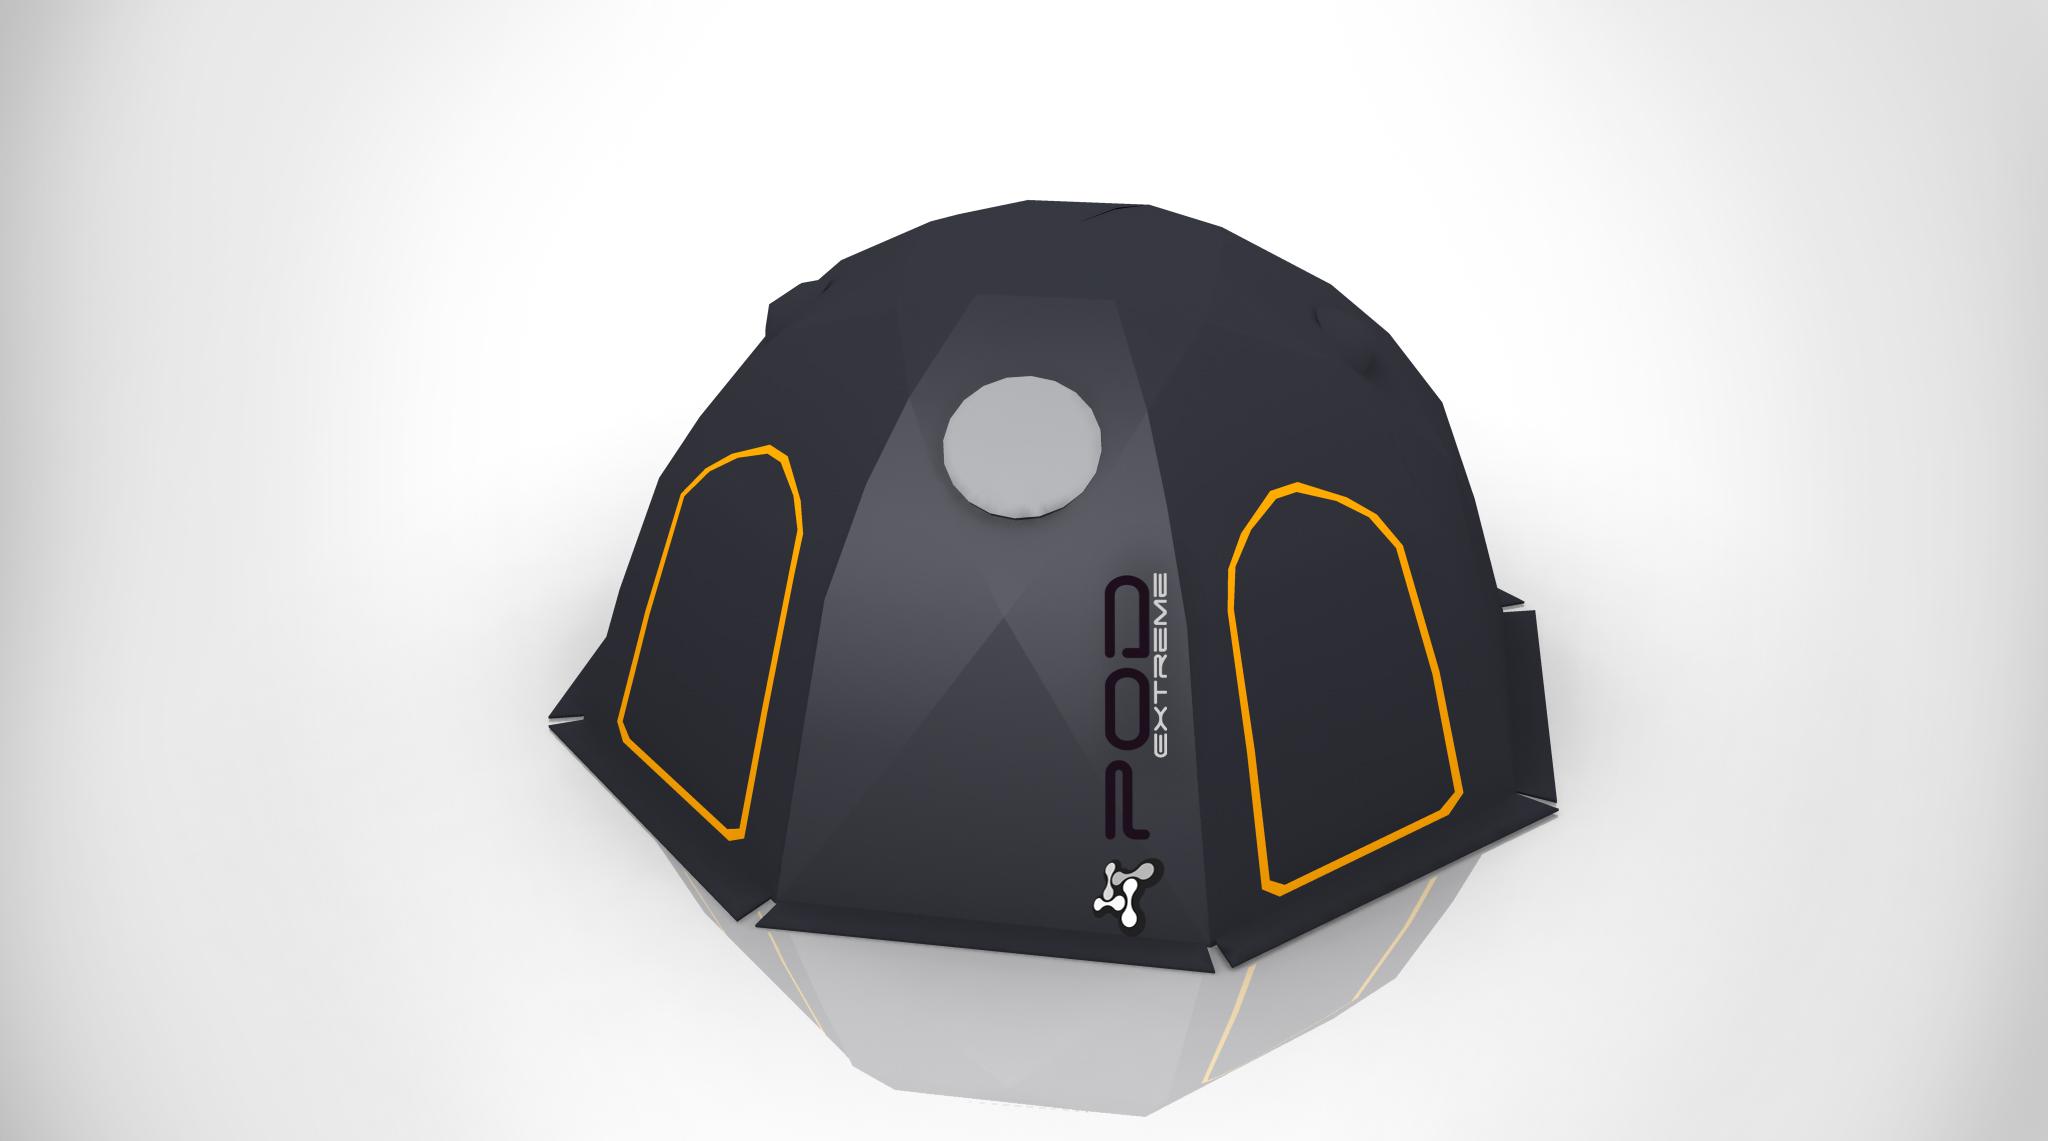 & Isnu0027t a Black tent hotter inside - Pod Tents explain why Pod Isnu0027t